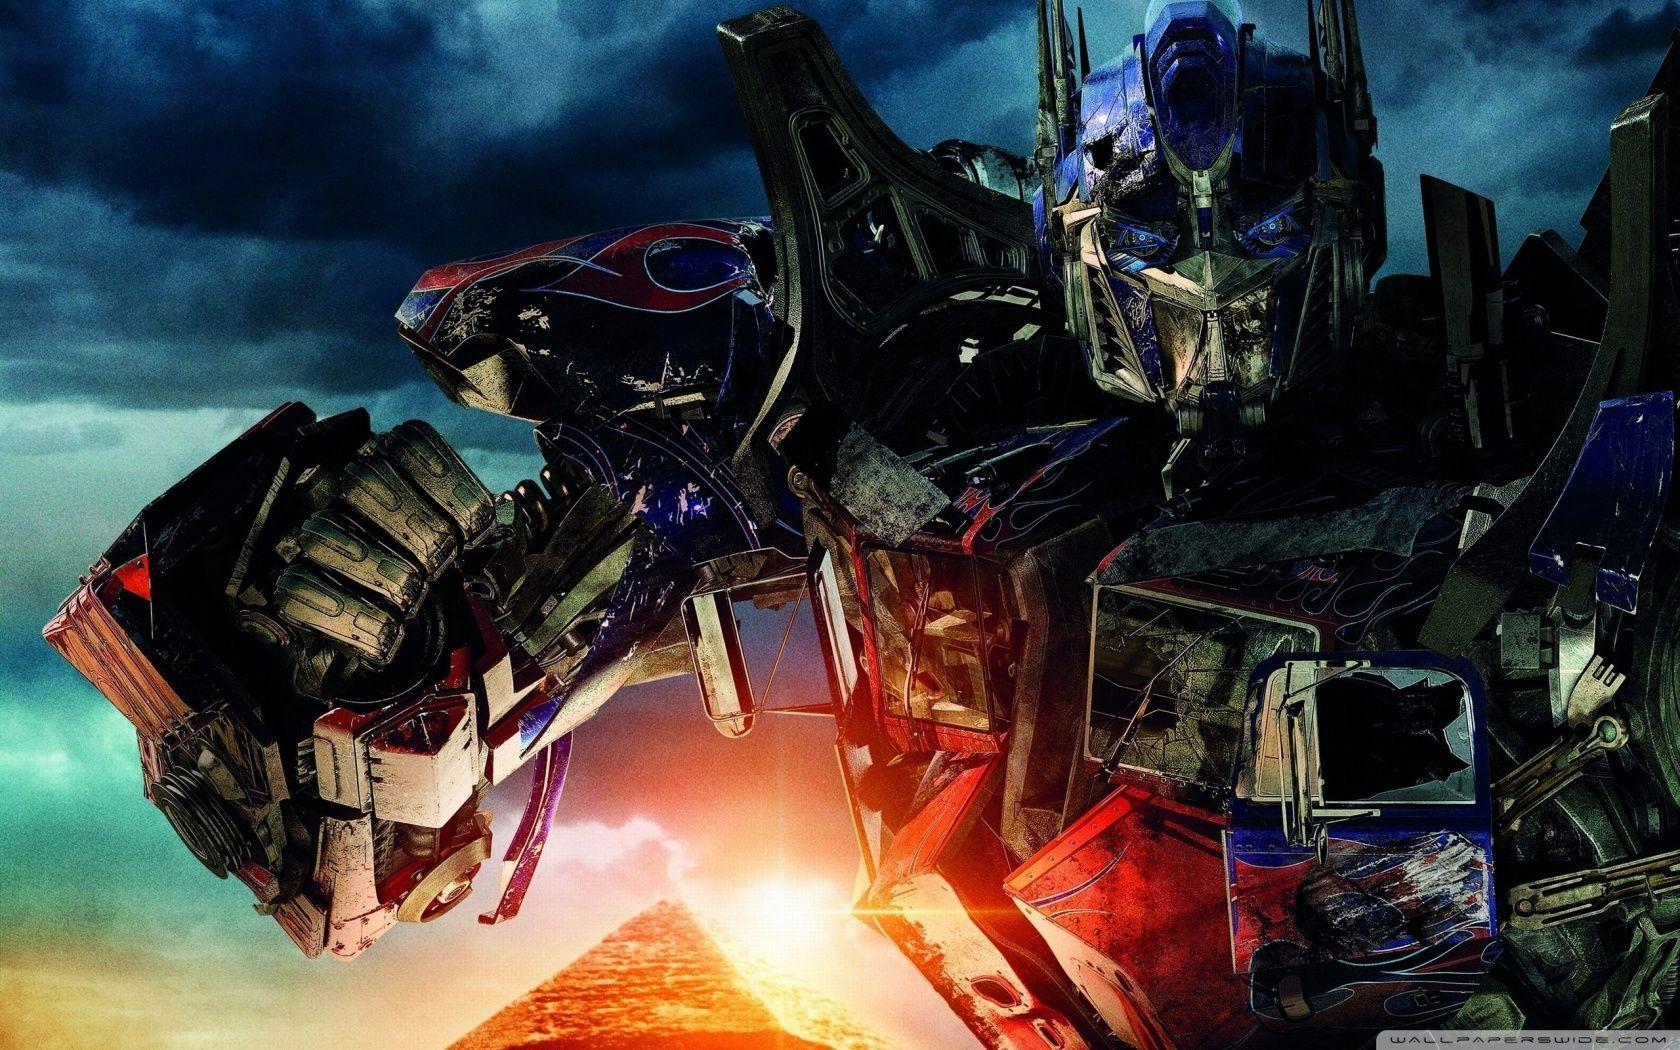 4K Ultra HD Transformers Wallpapers - Top Free 4K Ultra HD ...